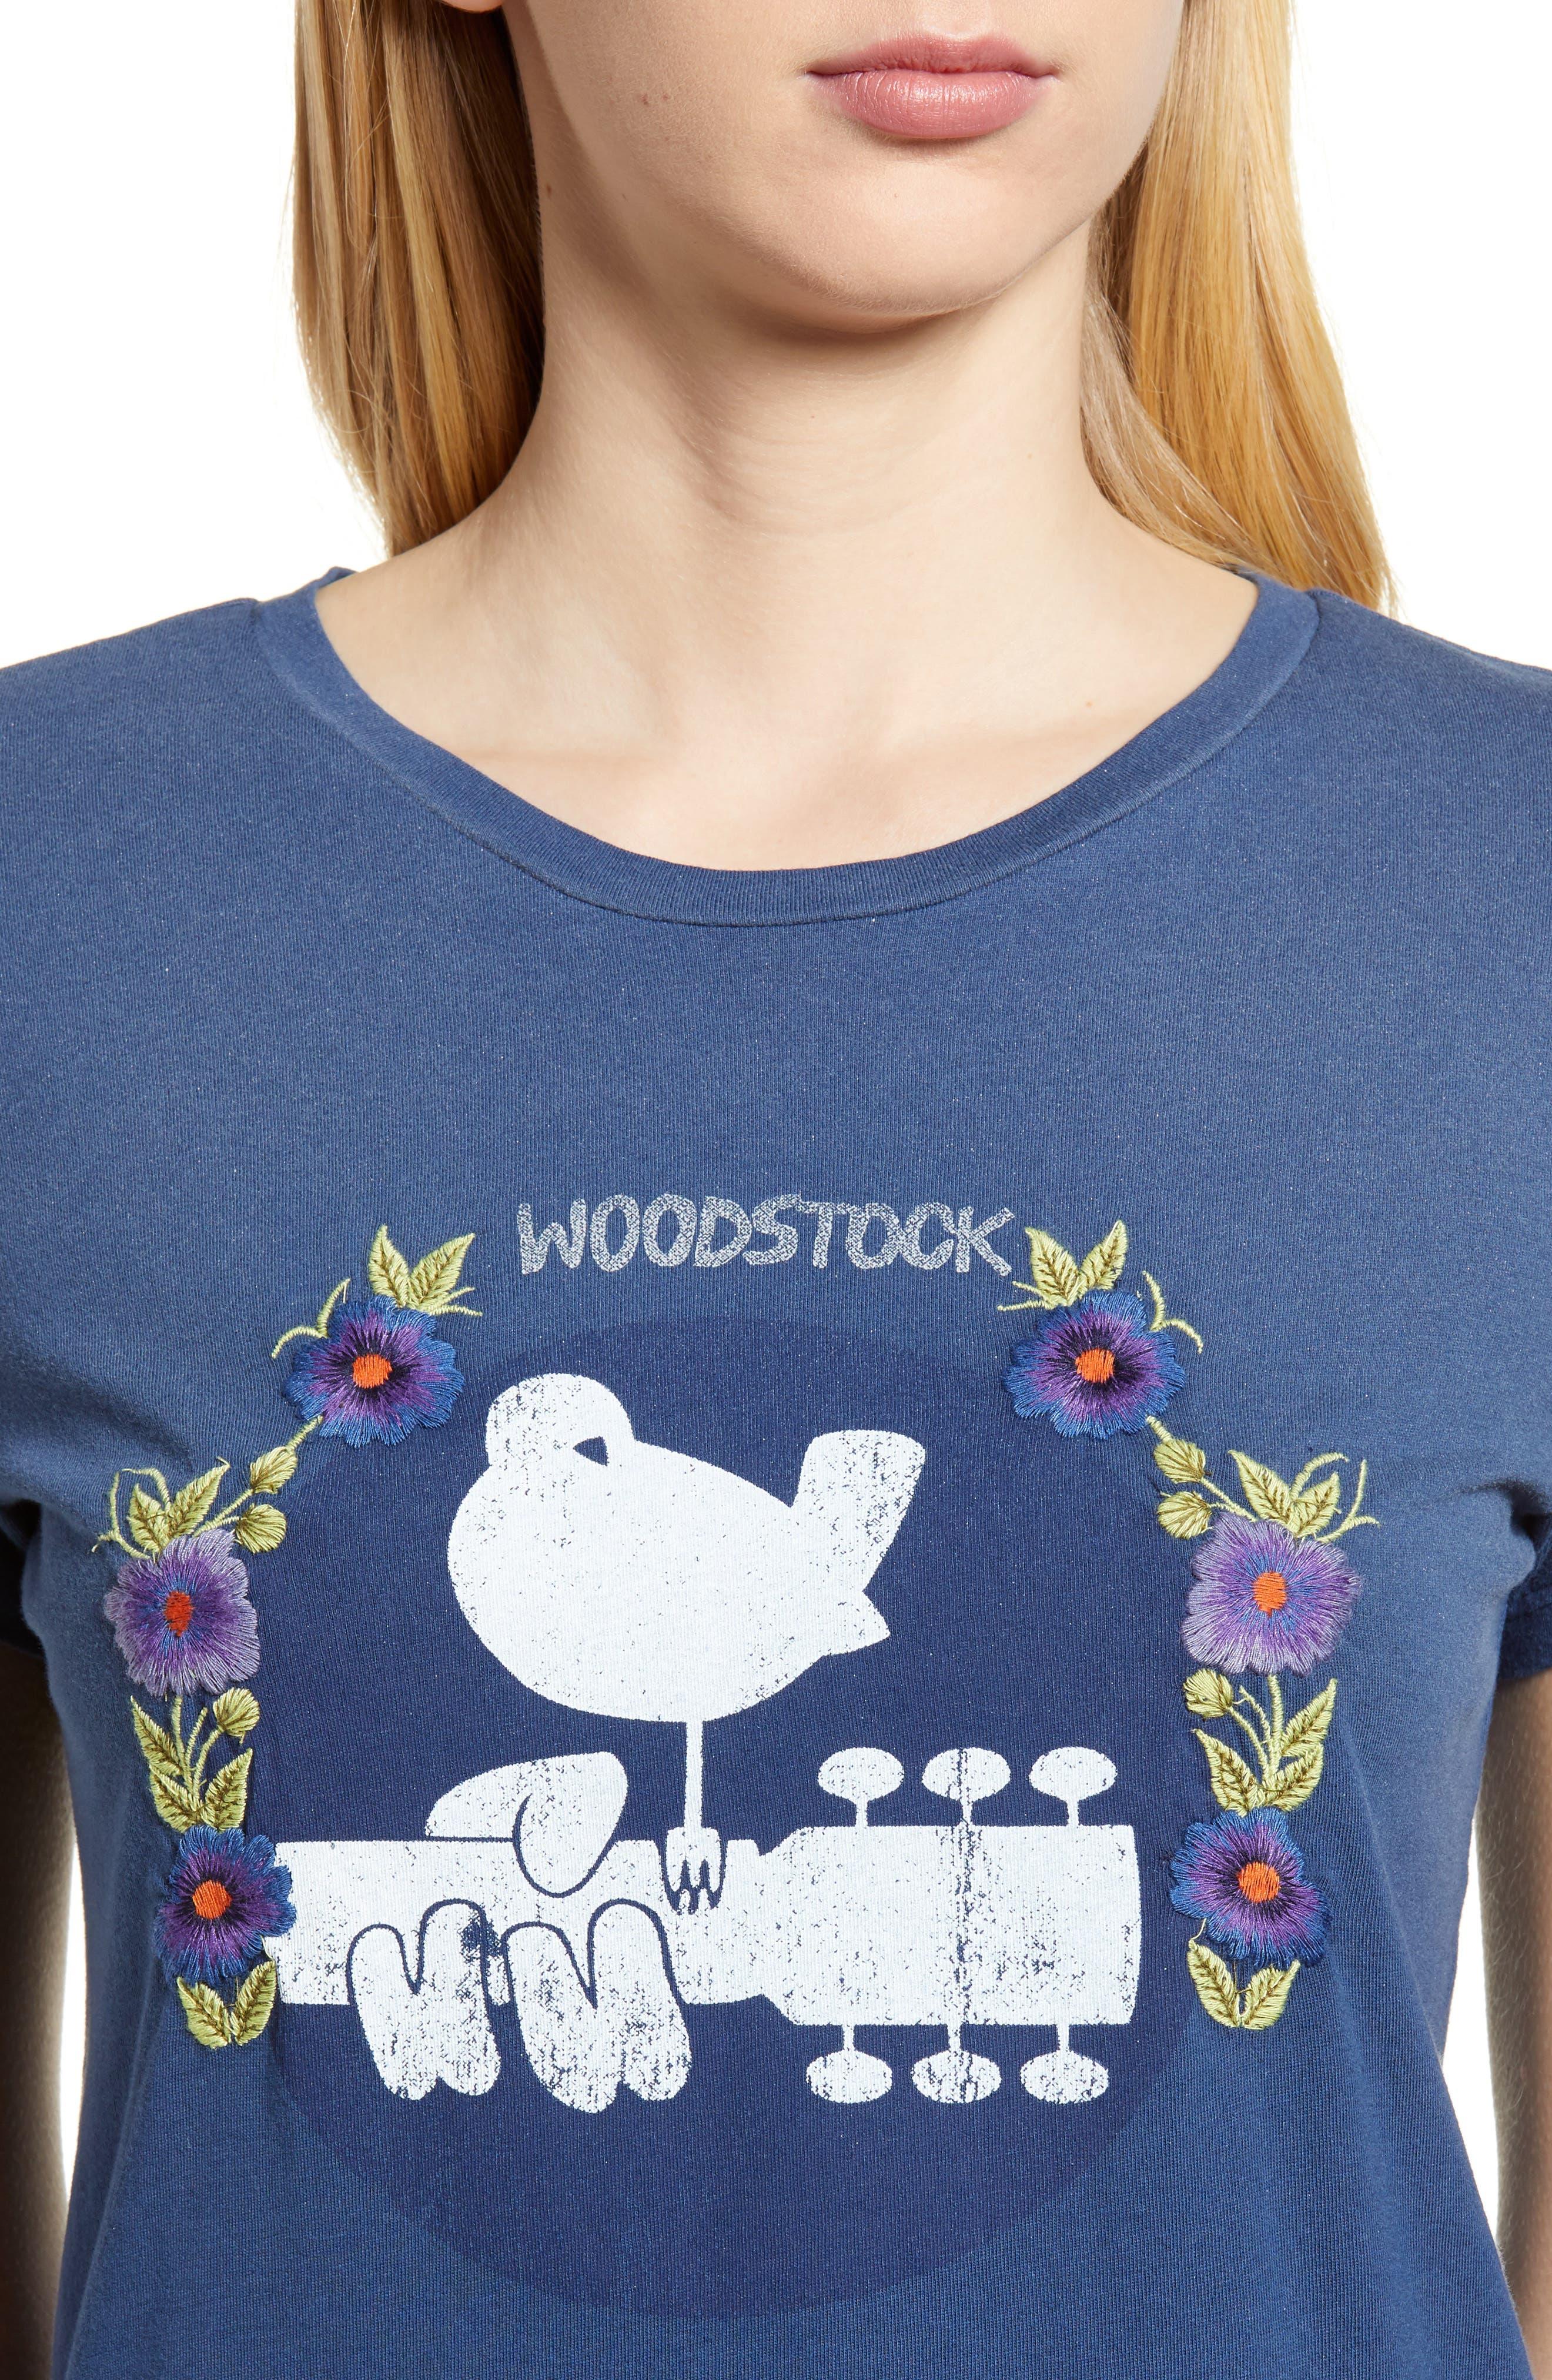 Embroidered Woodstock Tee,                             Alternate thumbnail 4, color,                             Indigo